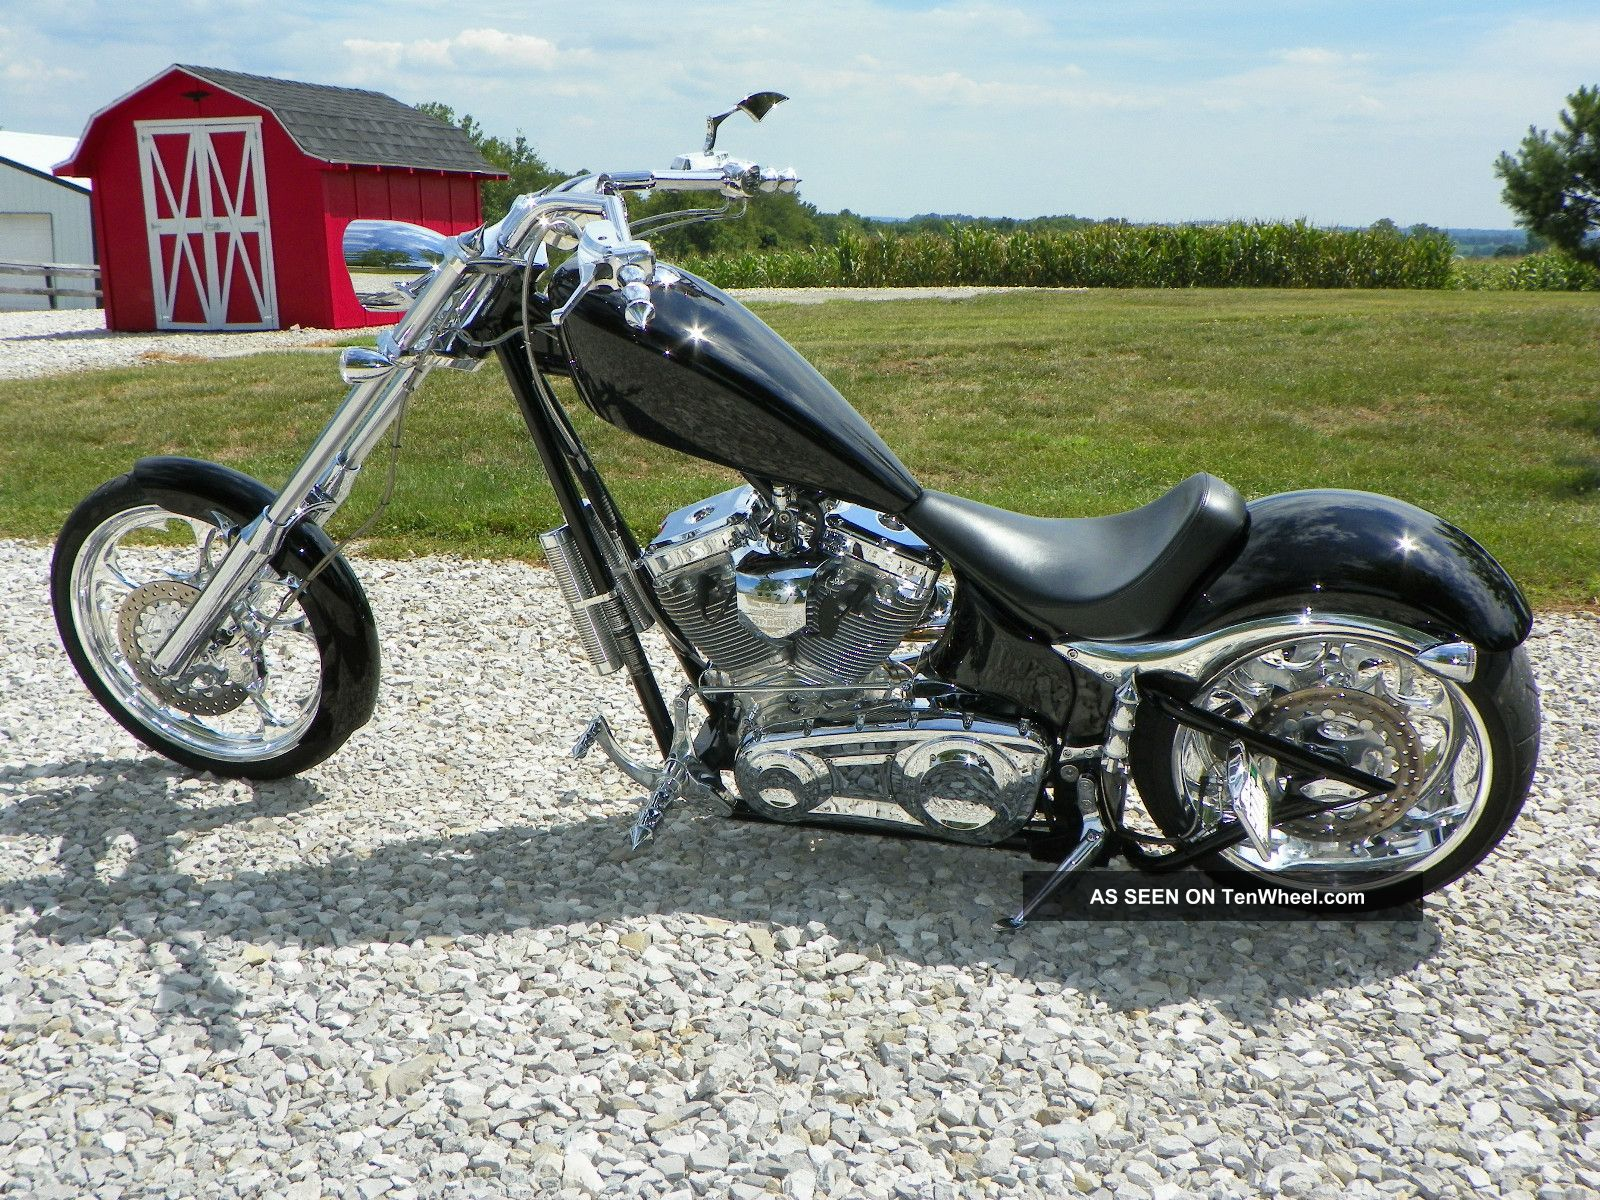 ... 6031 2007 big dog k9 chopper motorcycle on mercedes benz wiring diagrams ...